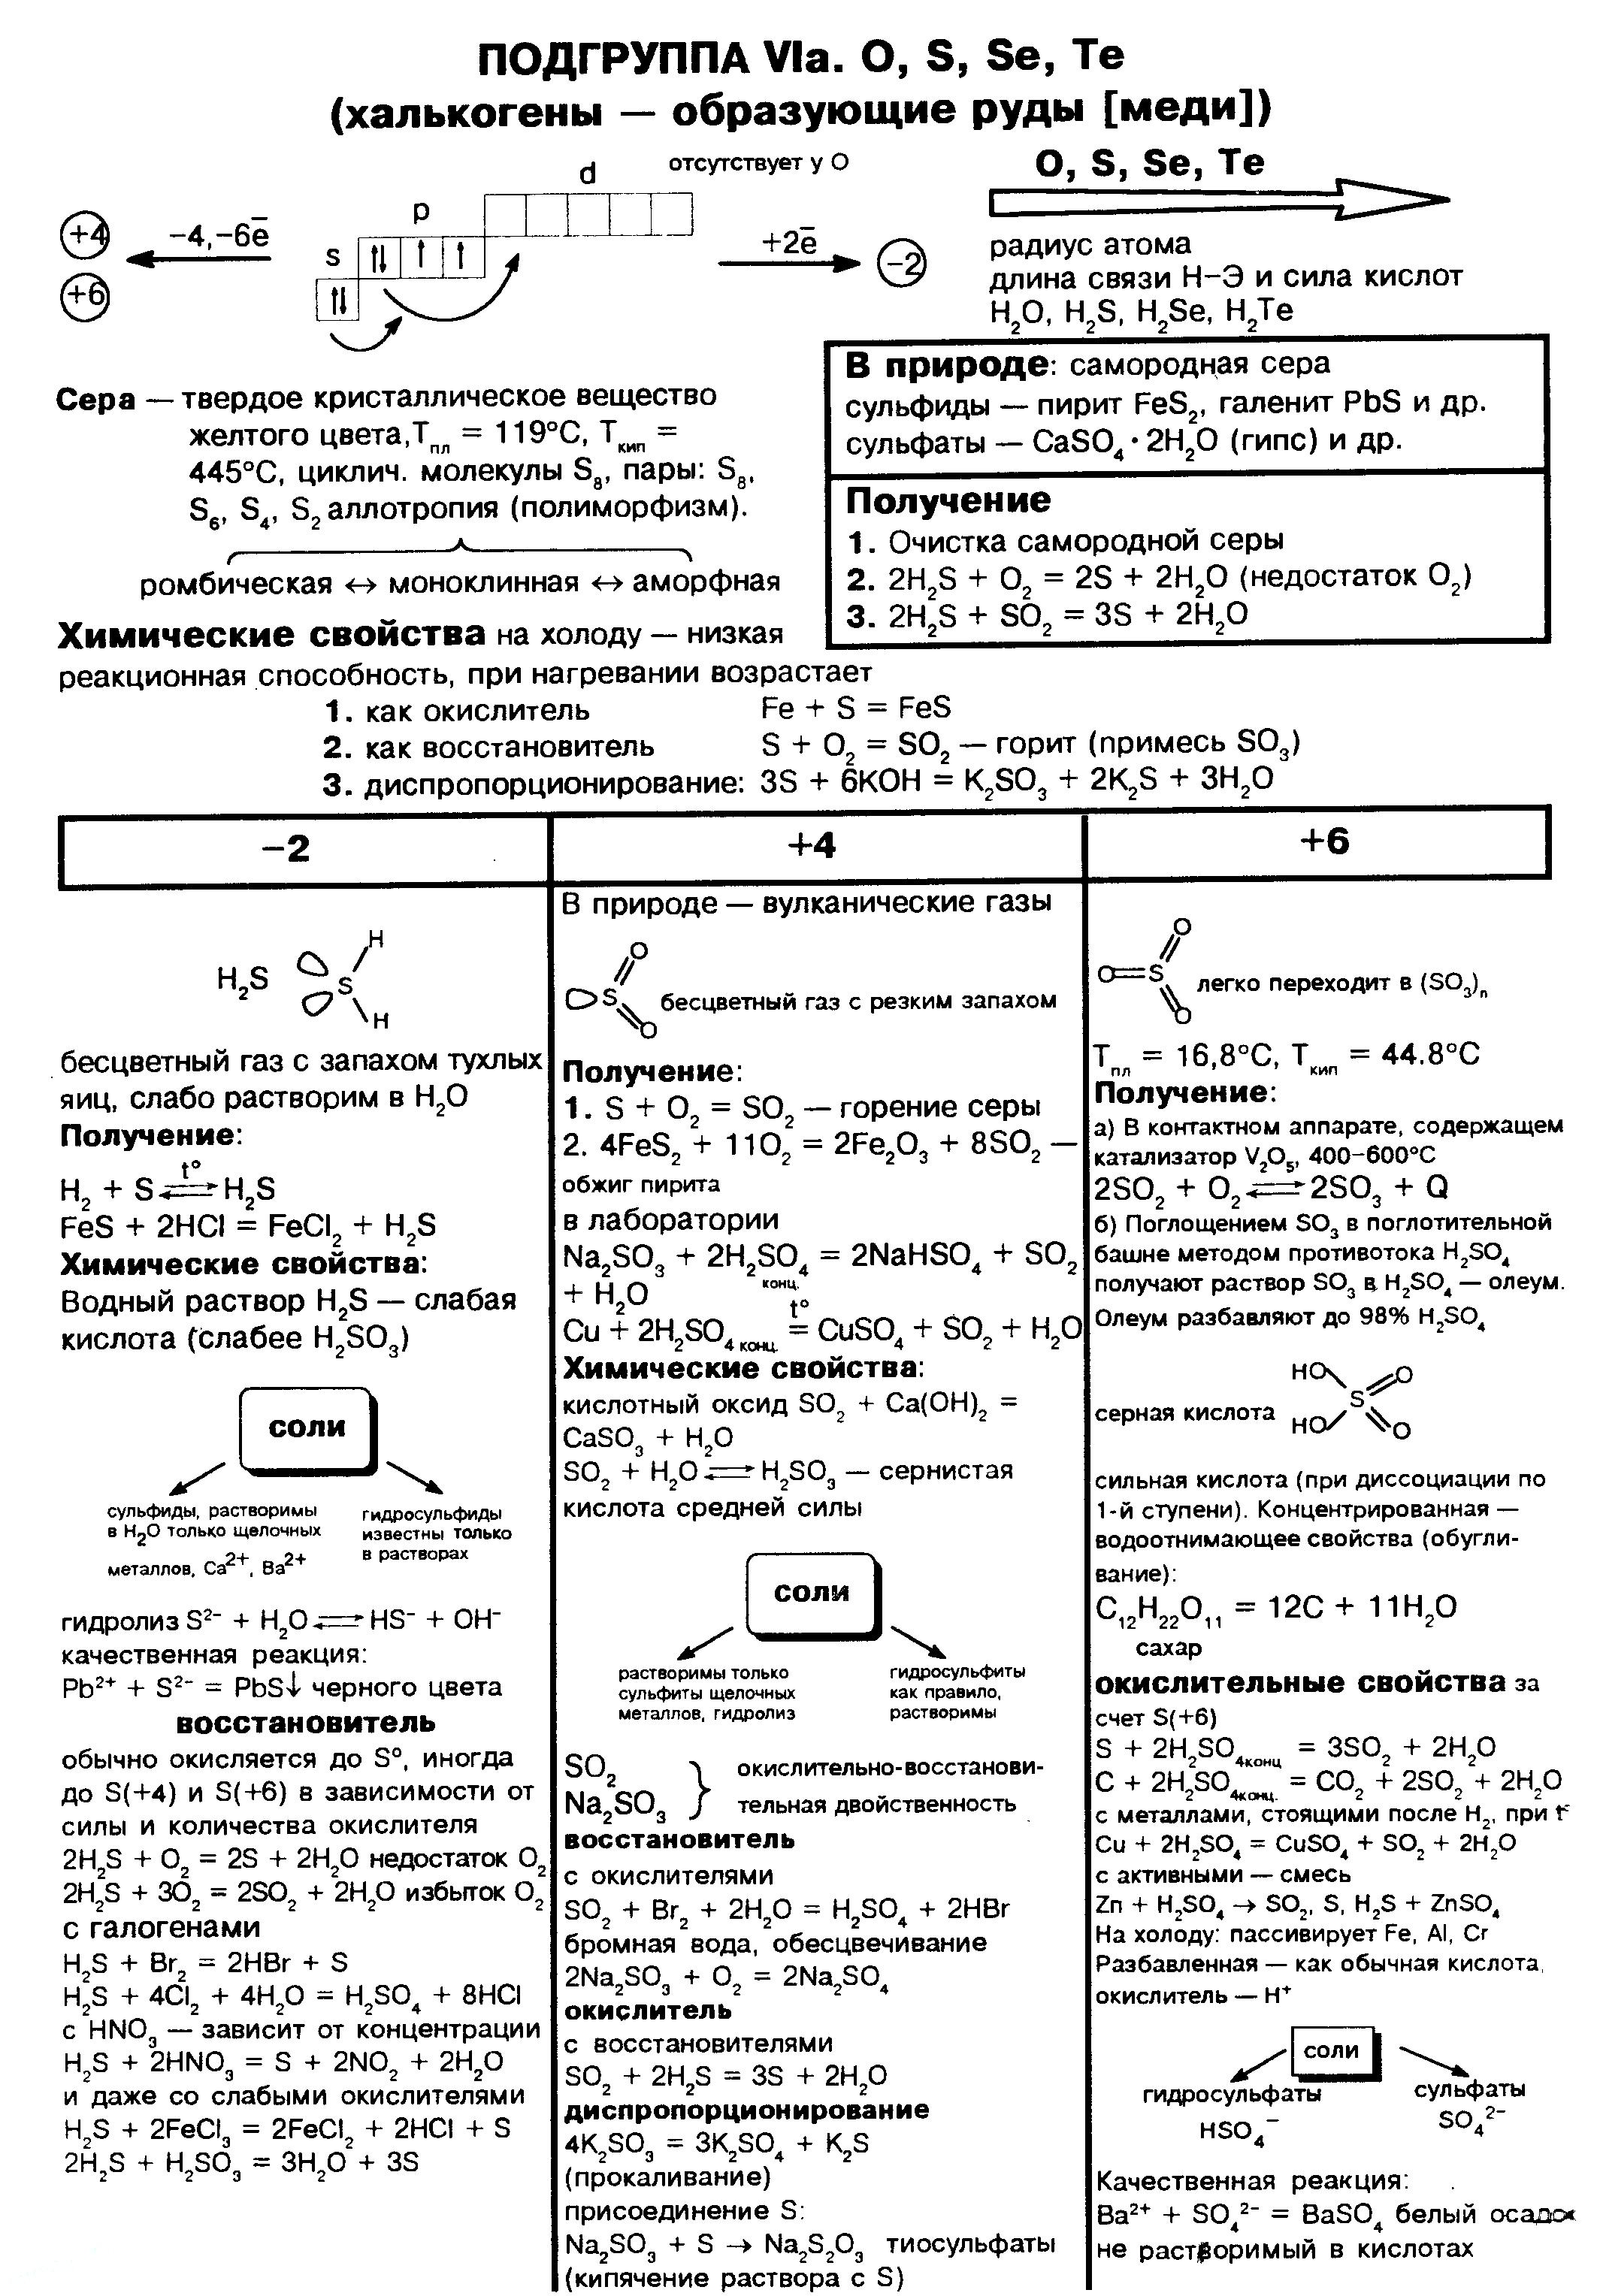 sera-ximicheskie-svojstva-poluchenie-via-gruppa